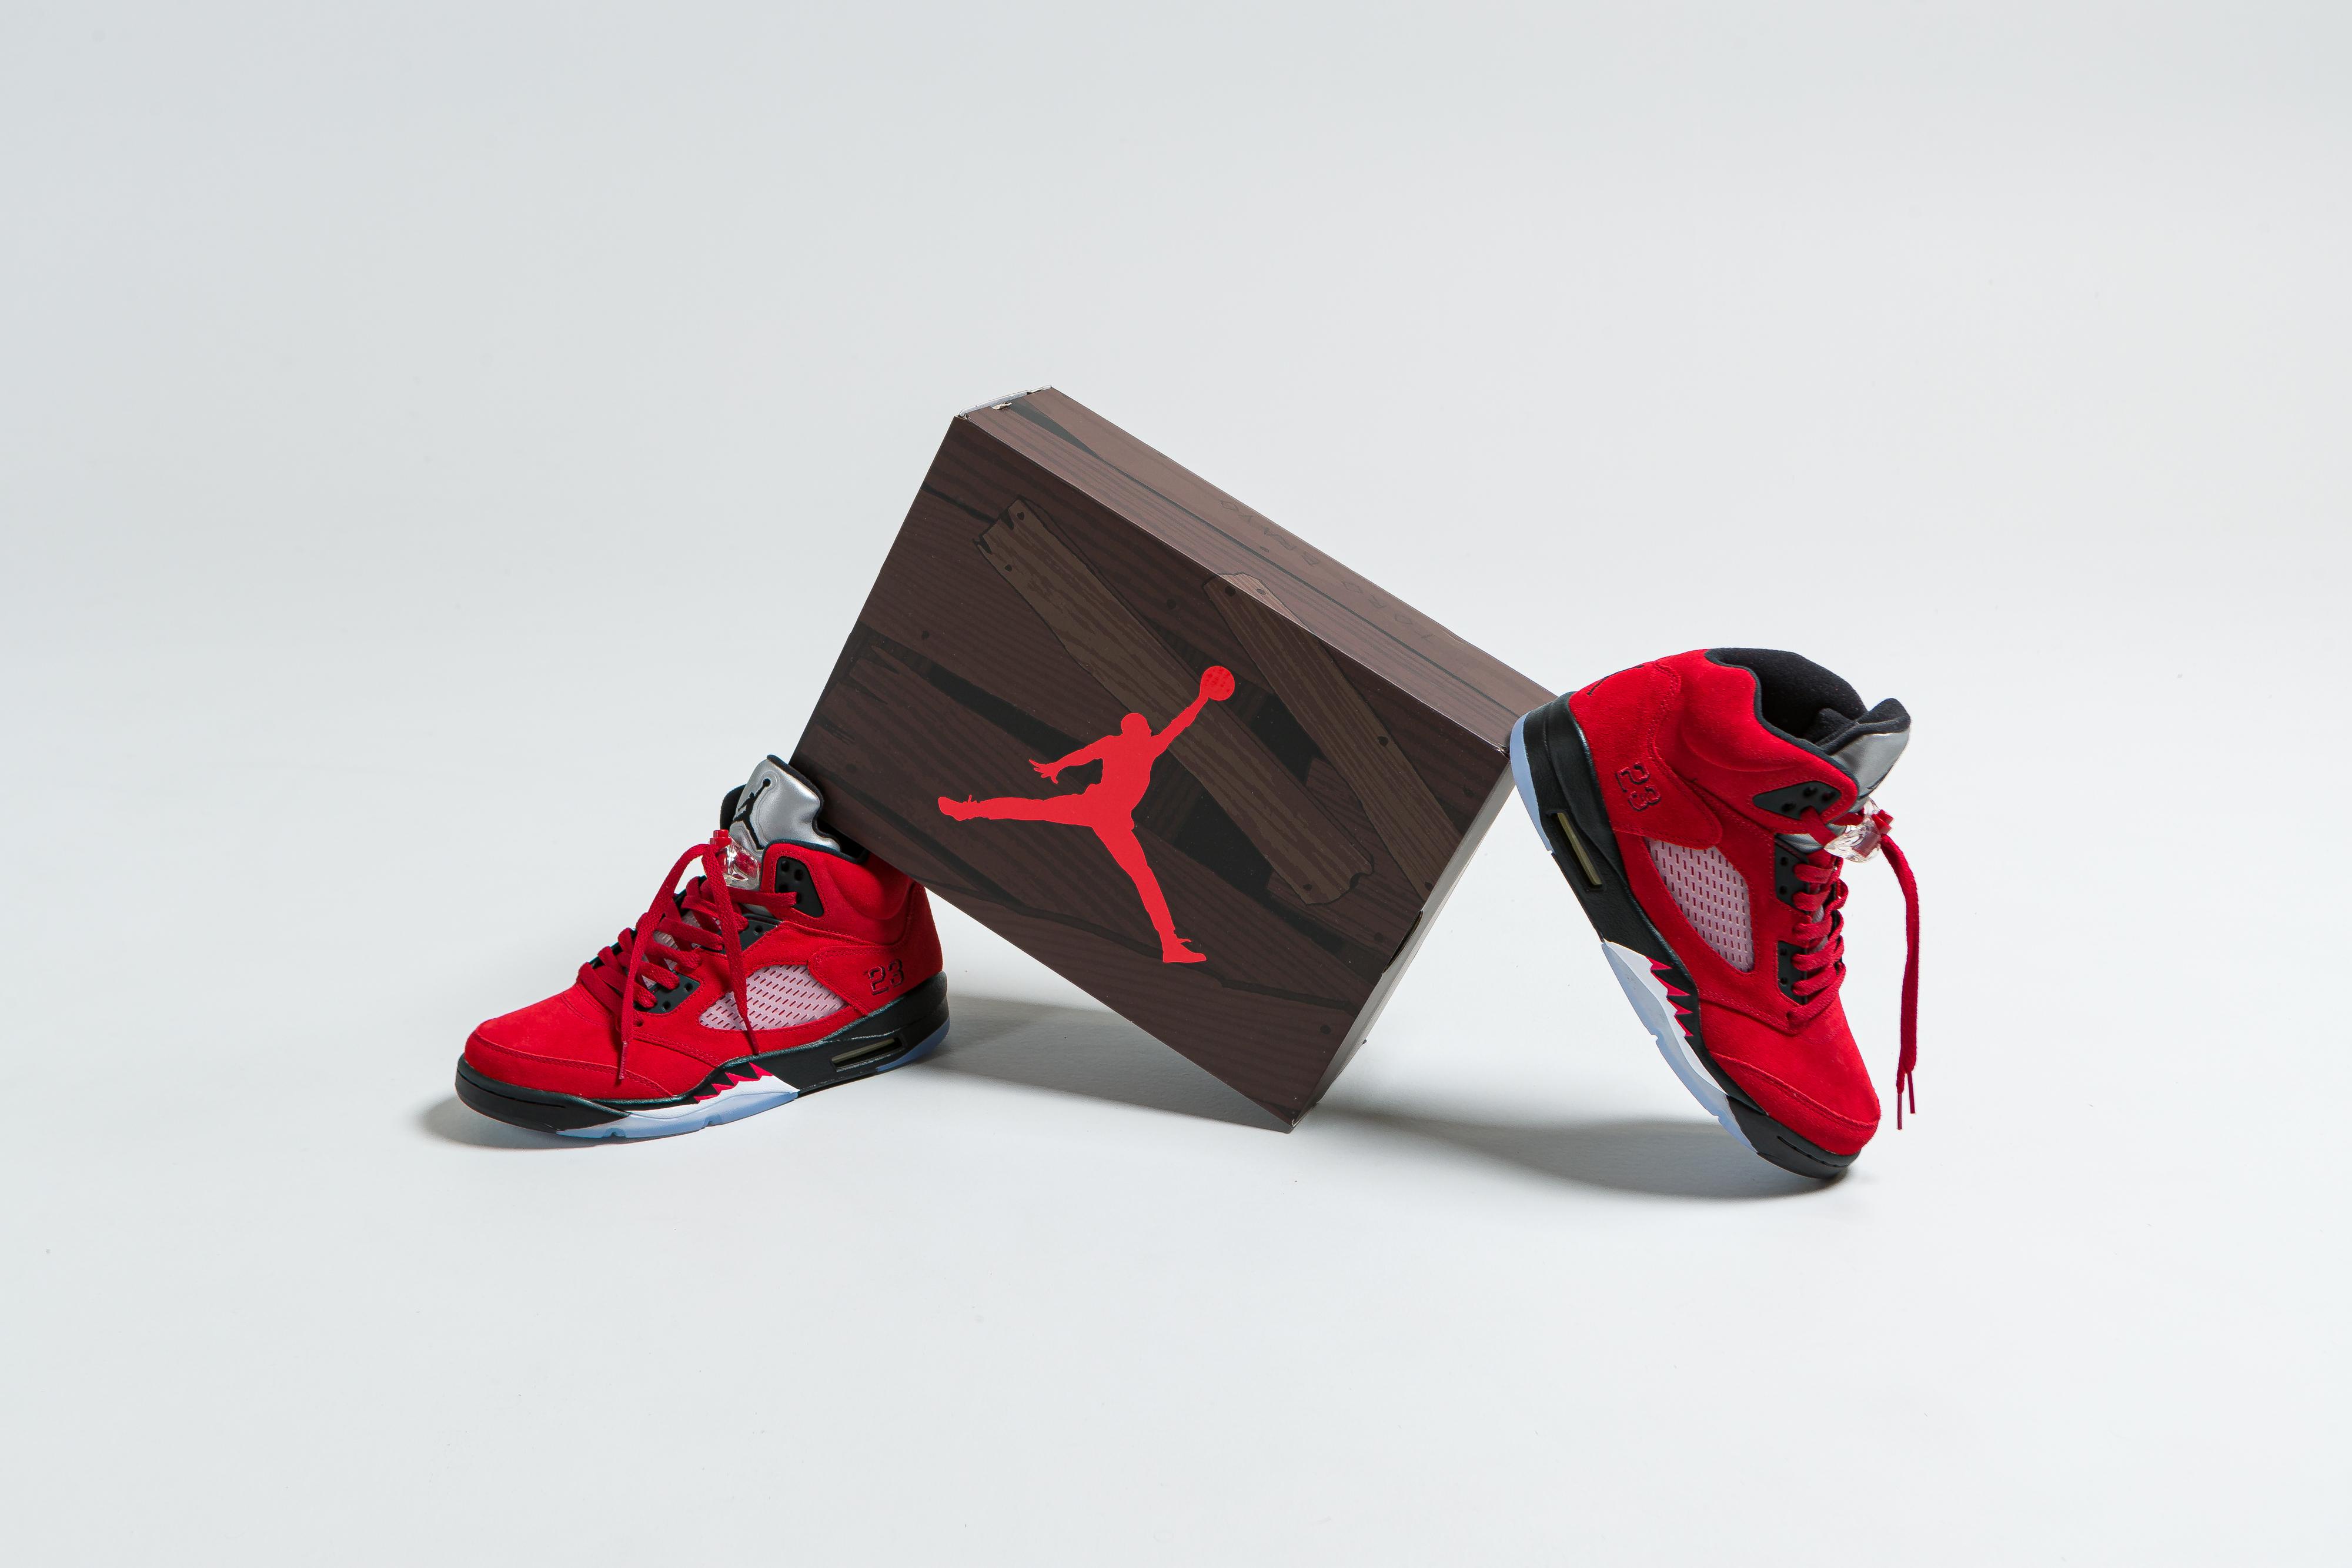 Jordan - Air Jordan 5 Retro - Varsity Red/Black-White - Up There